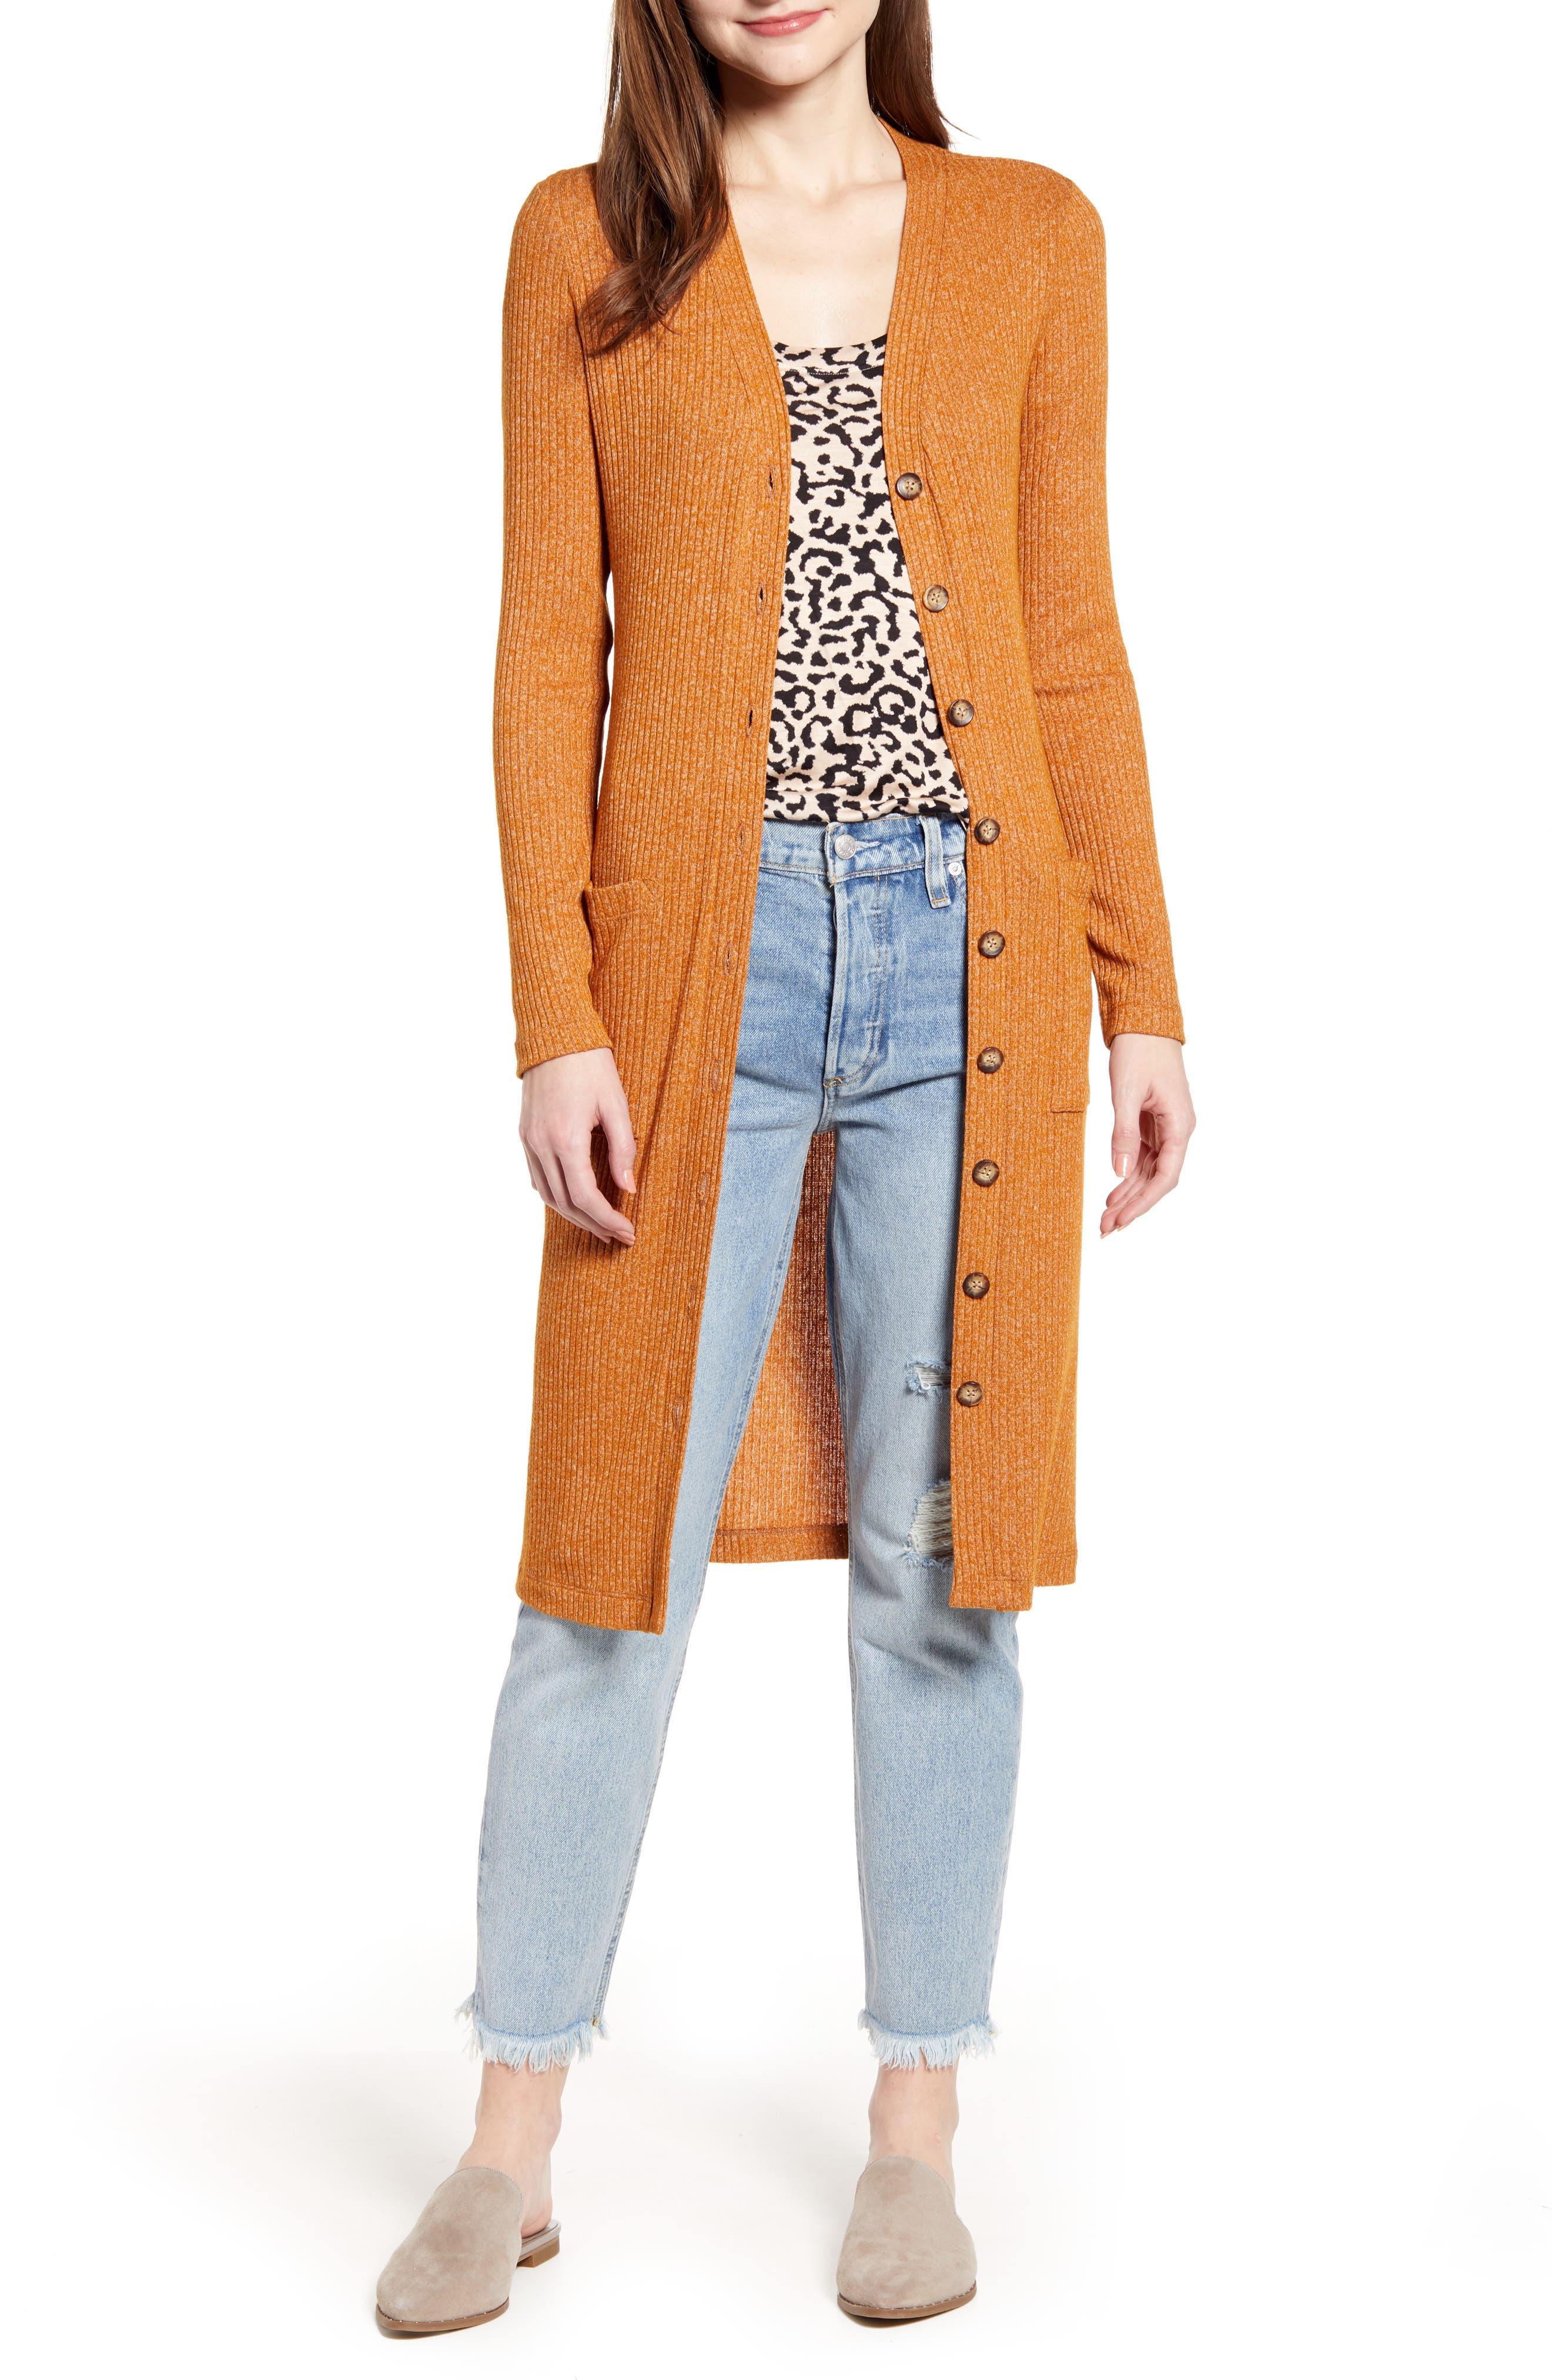 SOCIALITE Long Rib Knit Cardigan, Main, color, TOBACCO